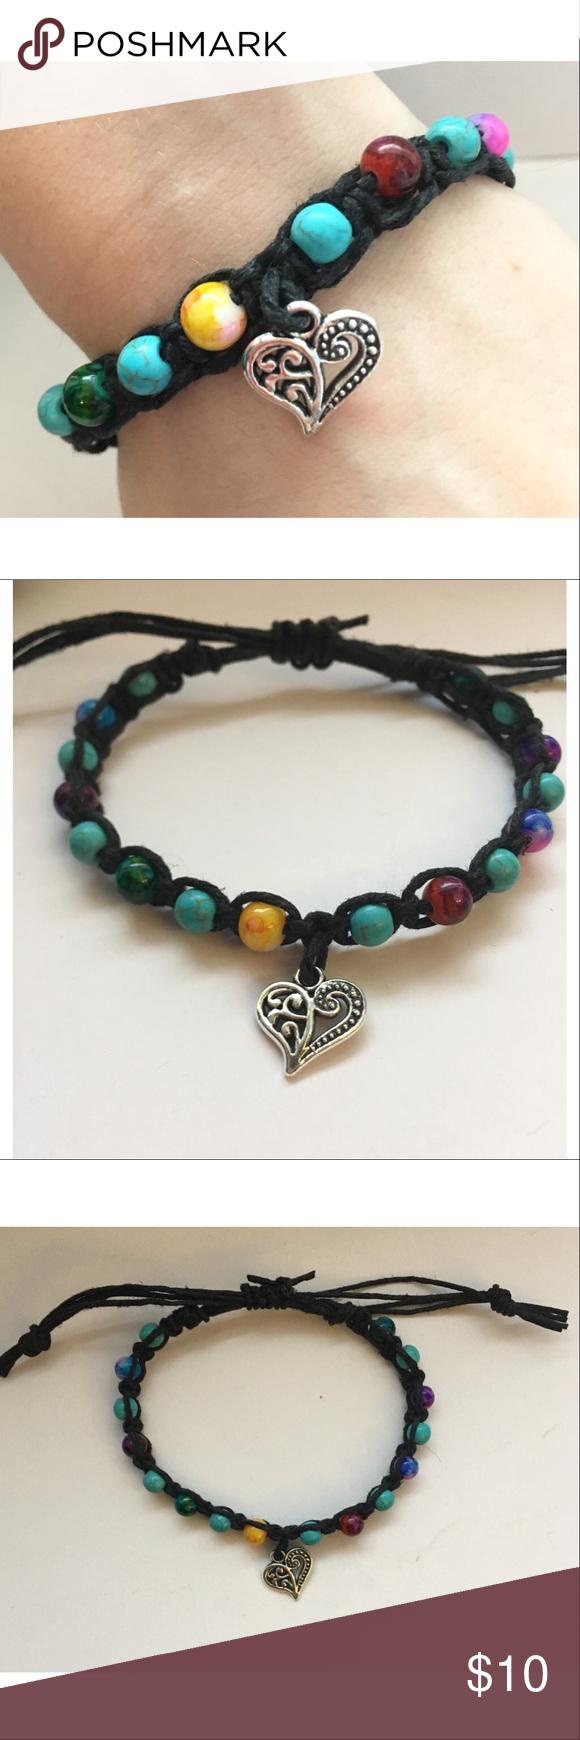 ✨🖤🌈Handmade Black Hemp Beaded Heart Bracelet Handmade black hemp multicolored beaded heart charm bracelet , 7 inches adjustable Jewelry Bracelets